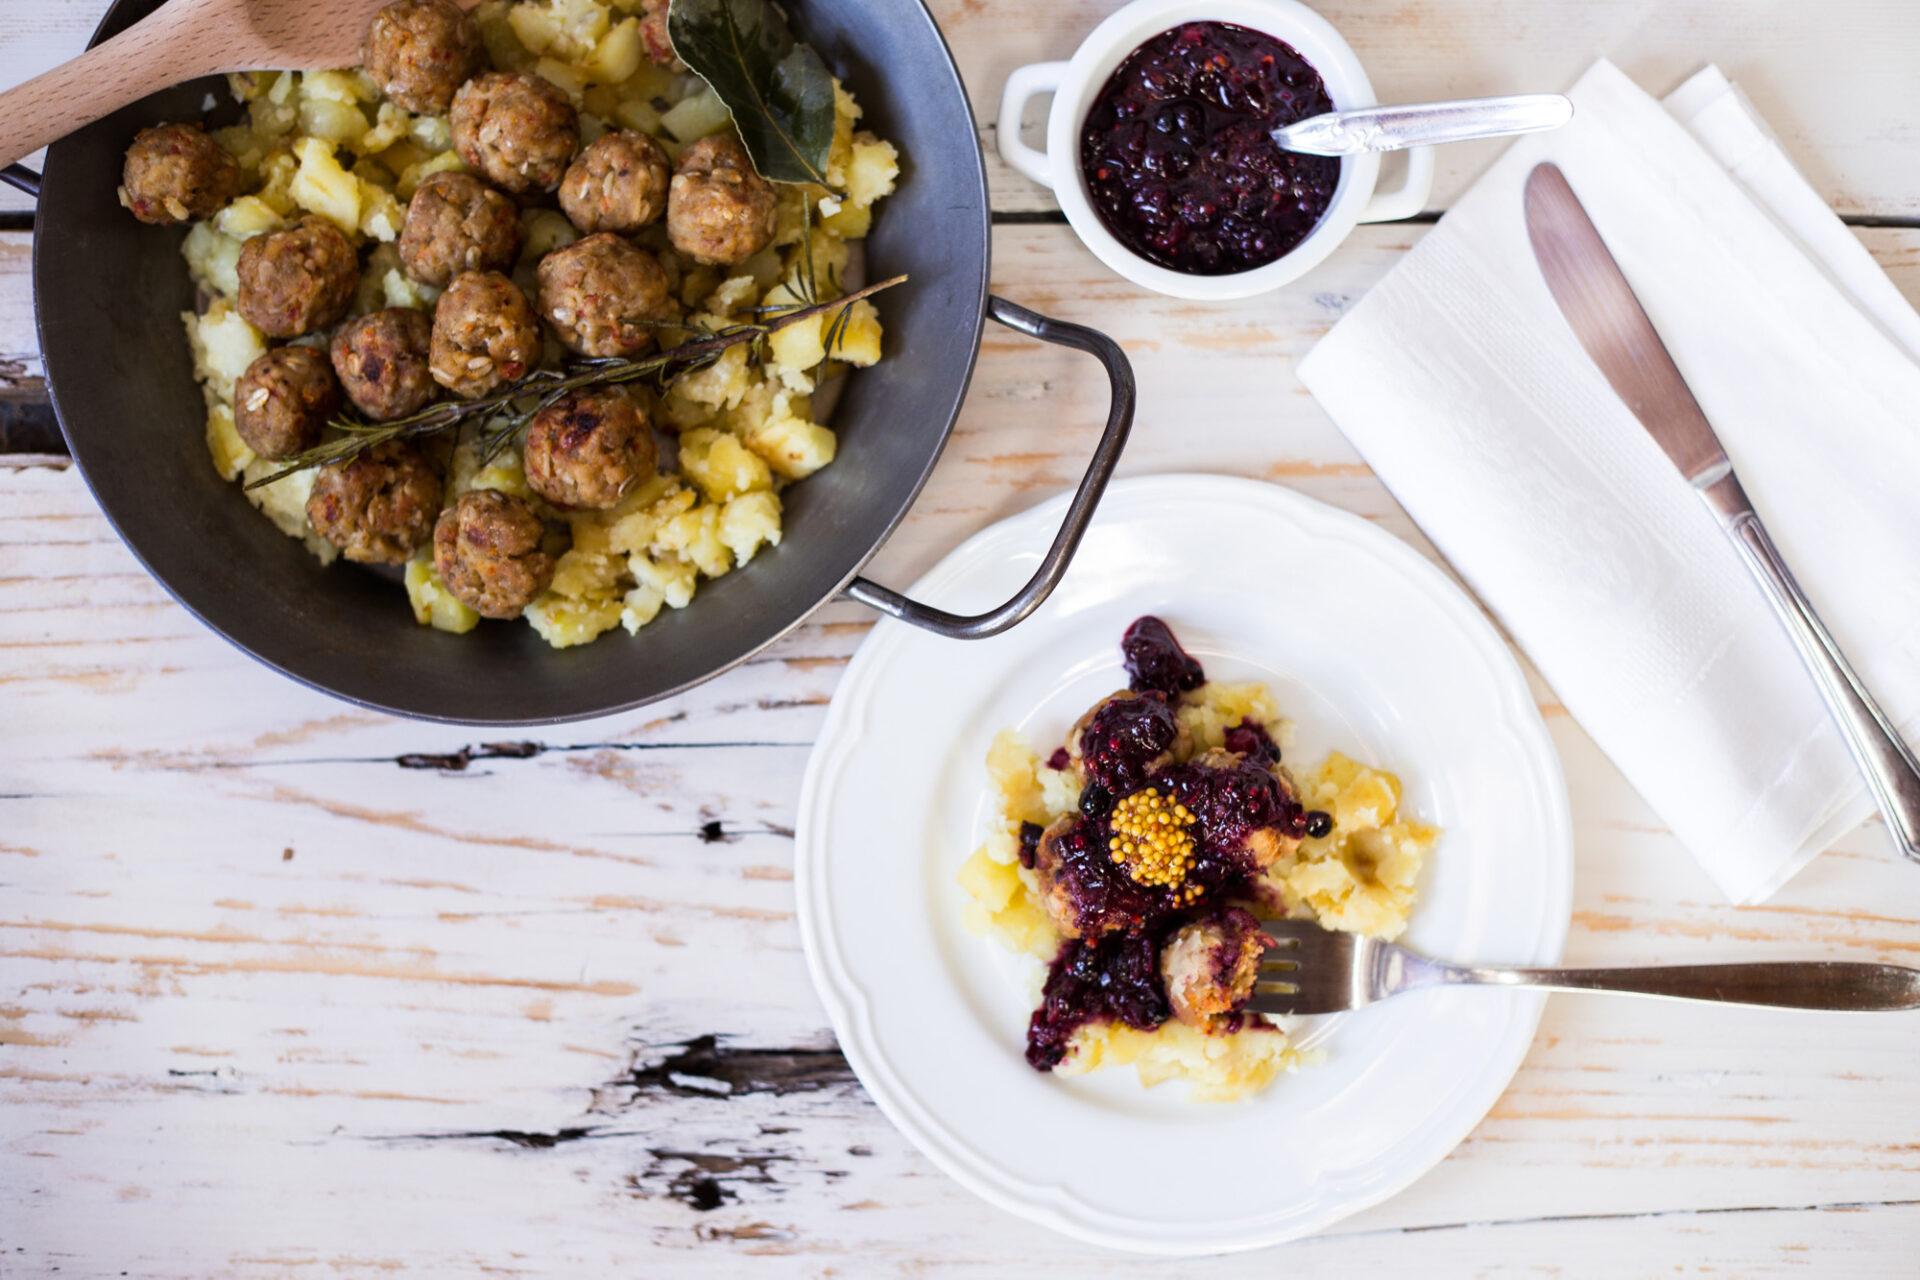 IMG 3707 1 - Secondi vegetariani: 10 gustose ricette - ricette-vegane-dal-web-